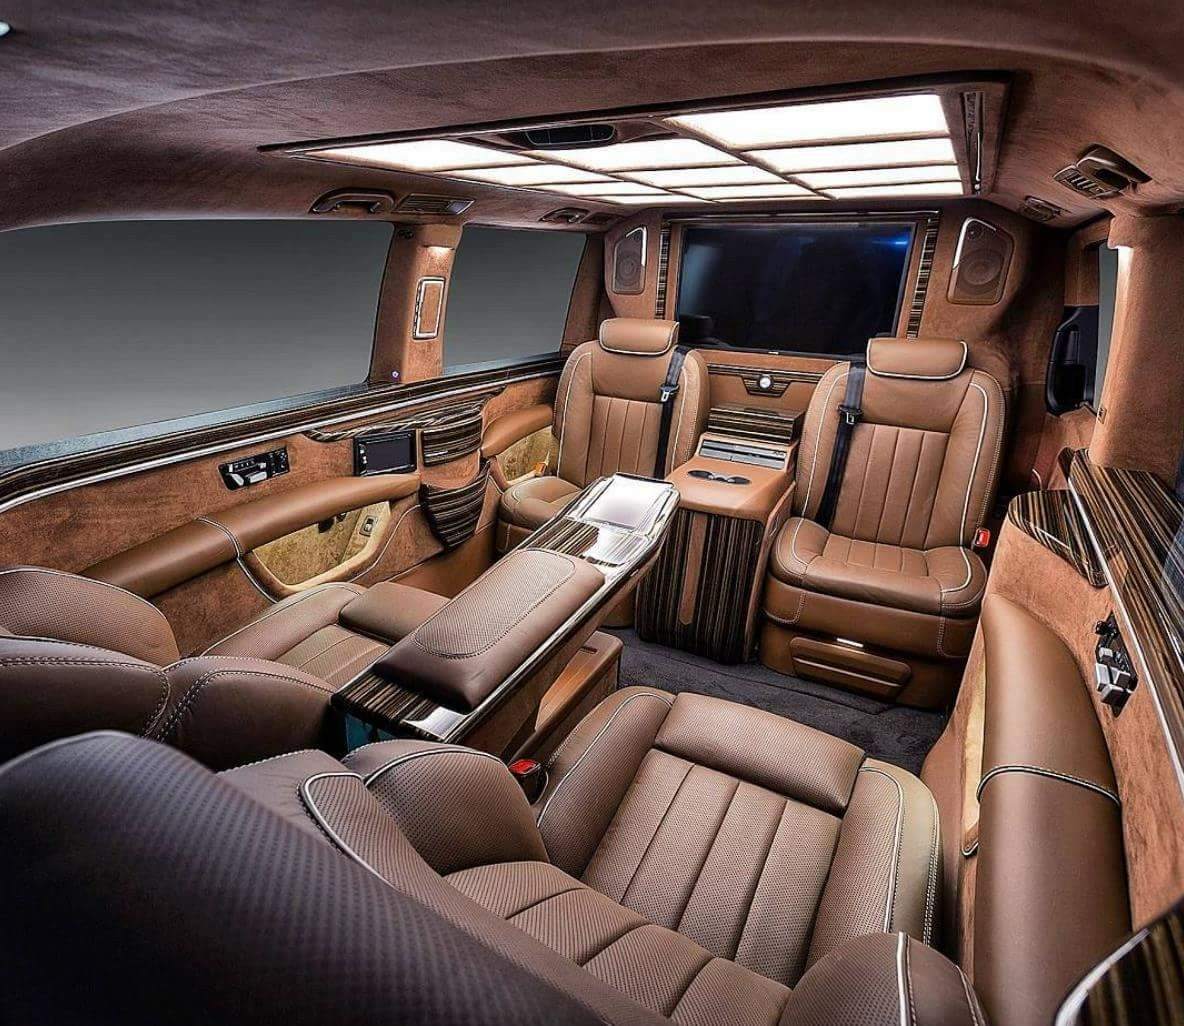 Pin by william buttlicker on LUX   Custom car interior ...